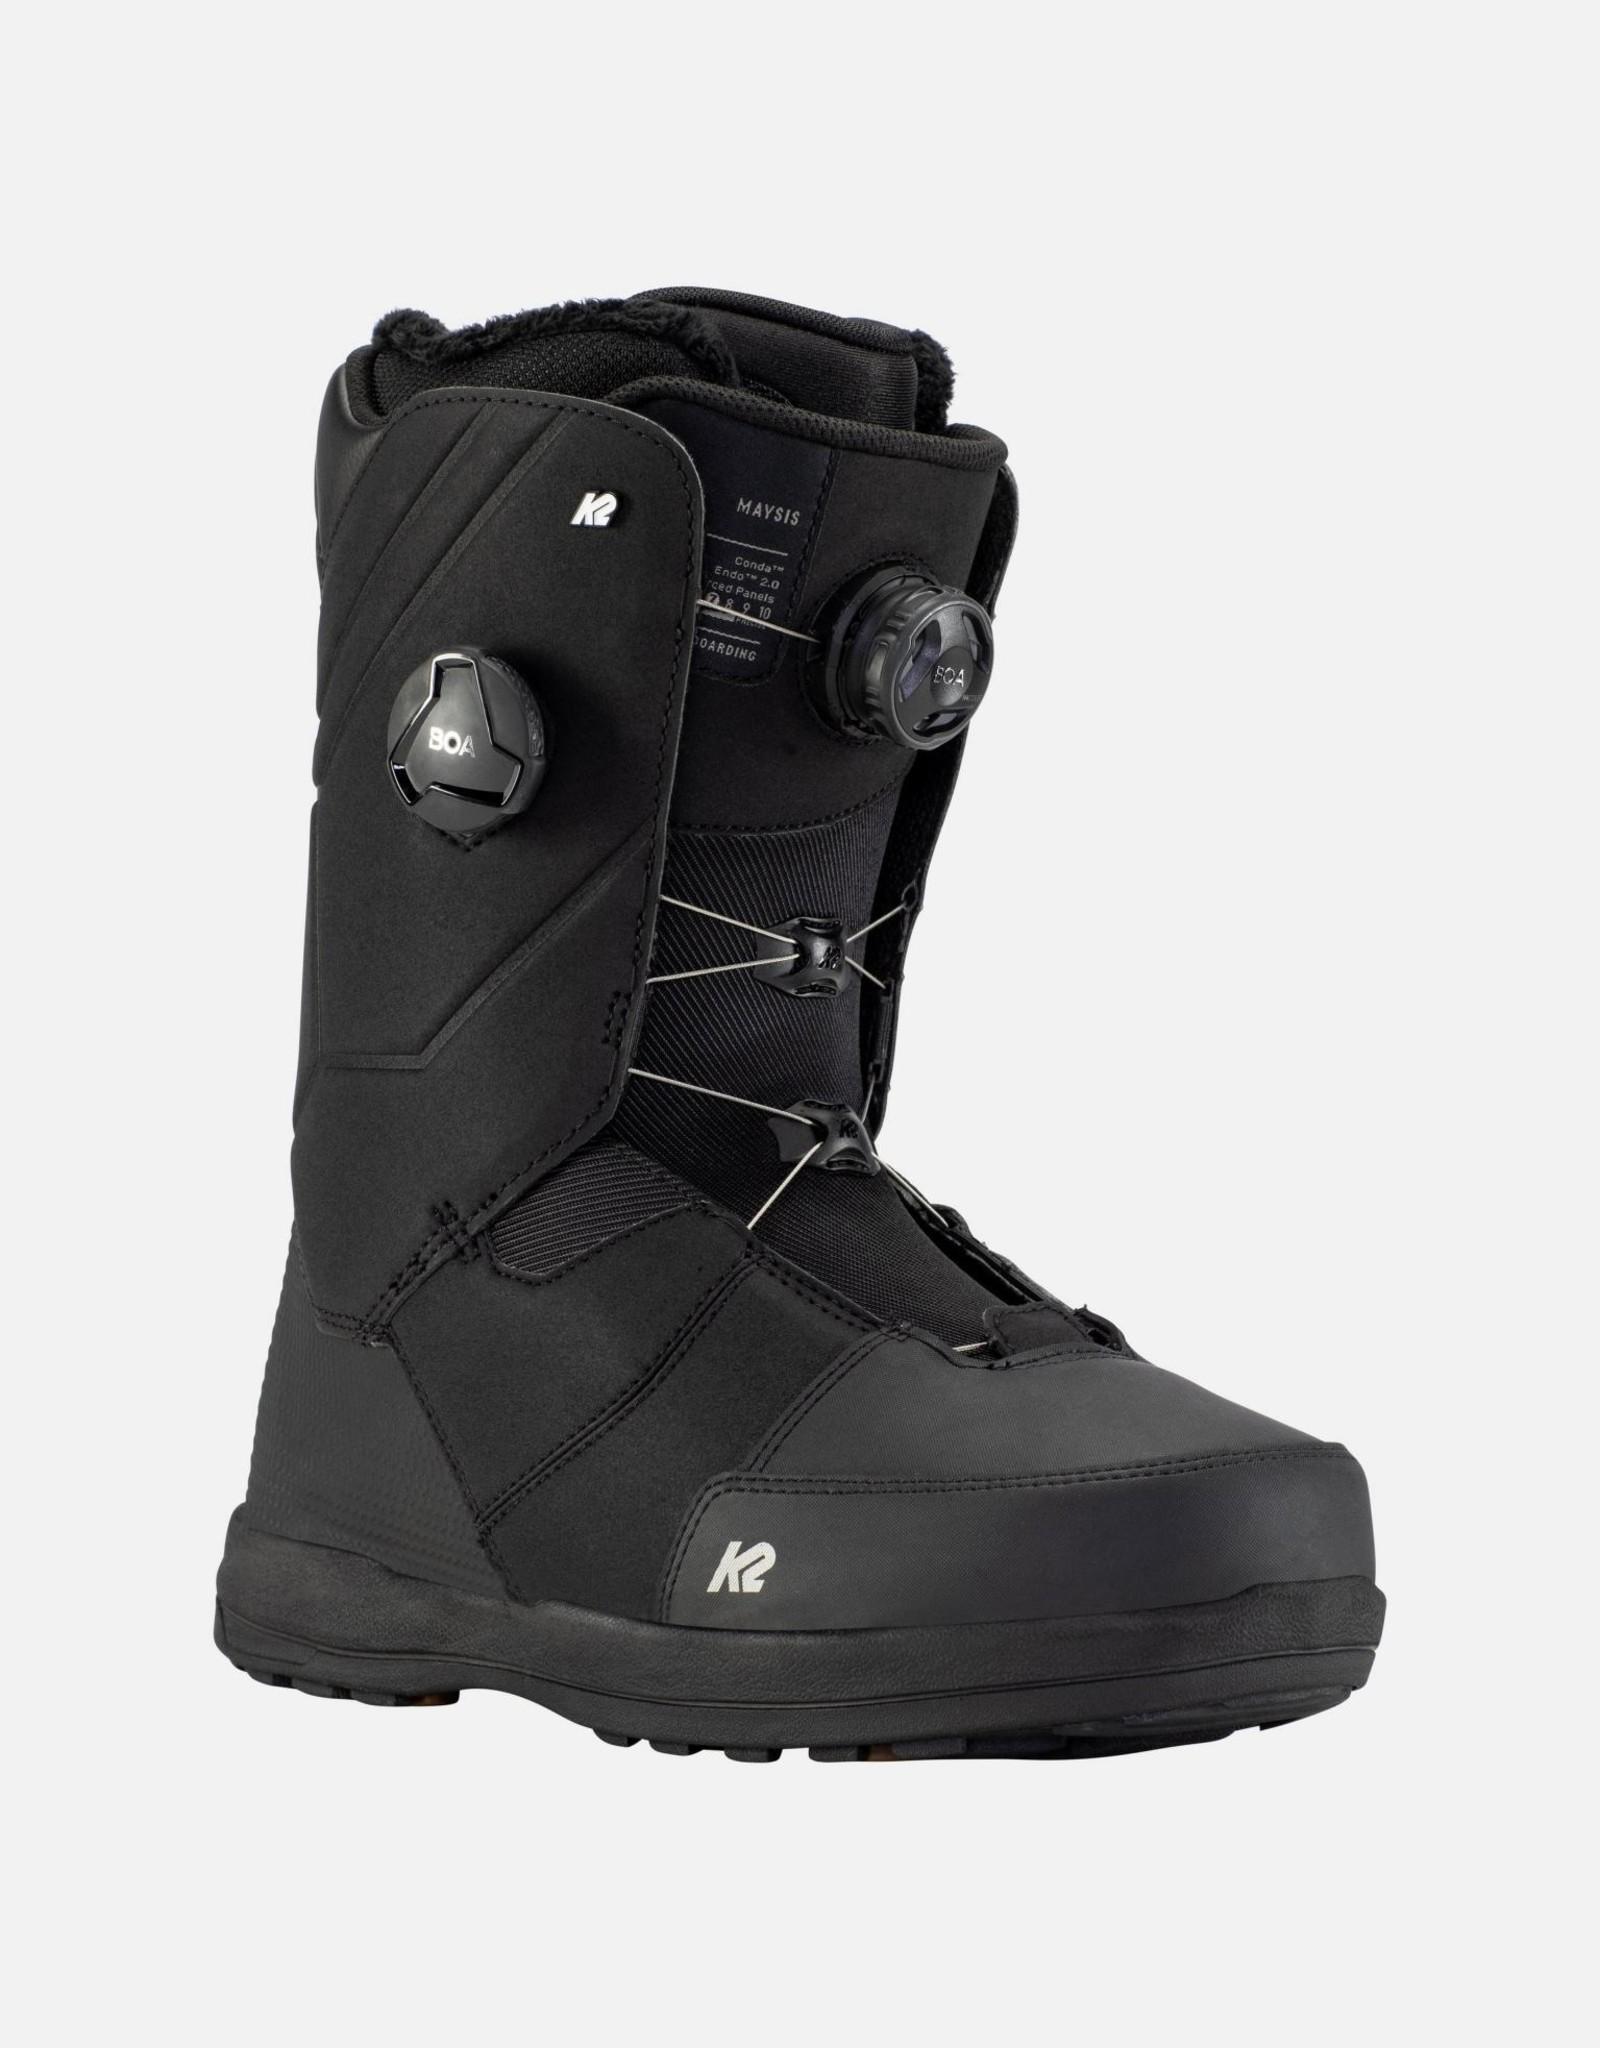 K2 - MAYSIS Mens BOOT (2021) - Black -